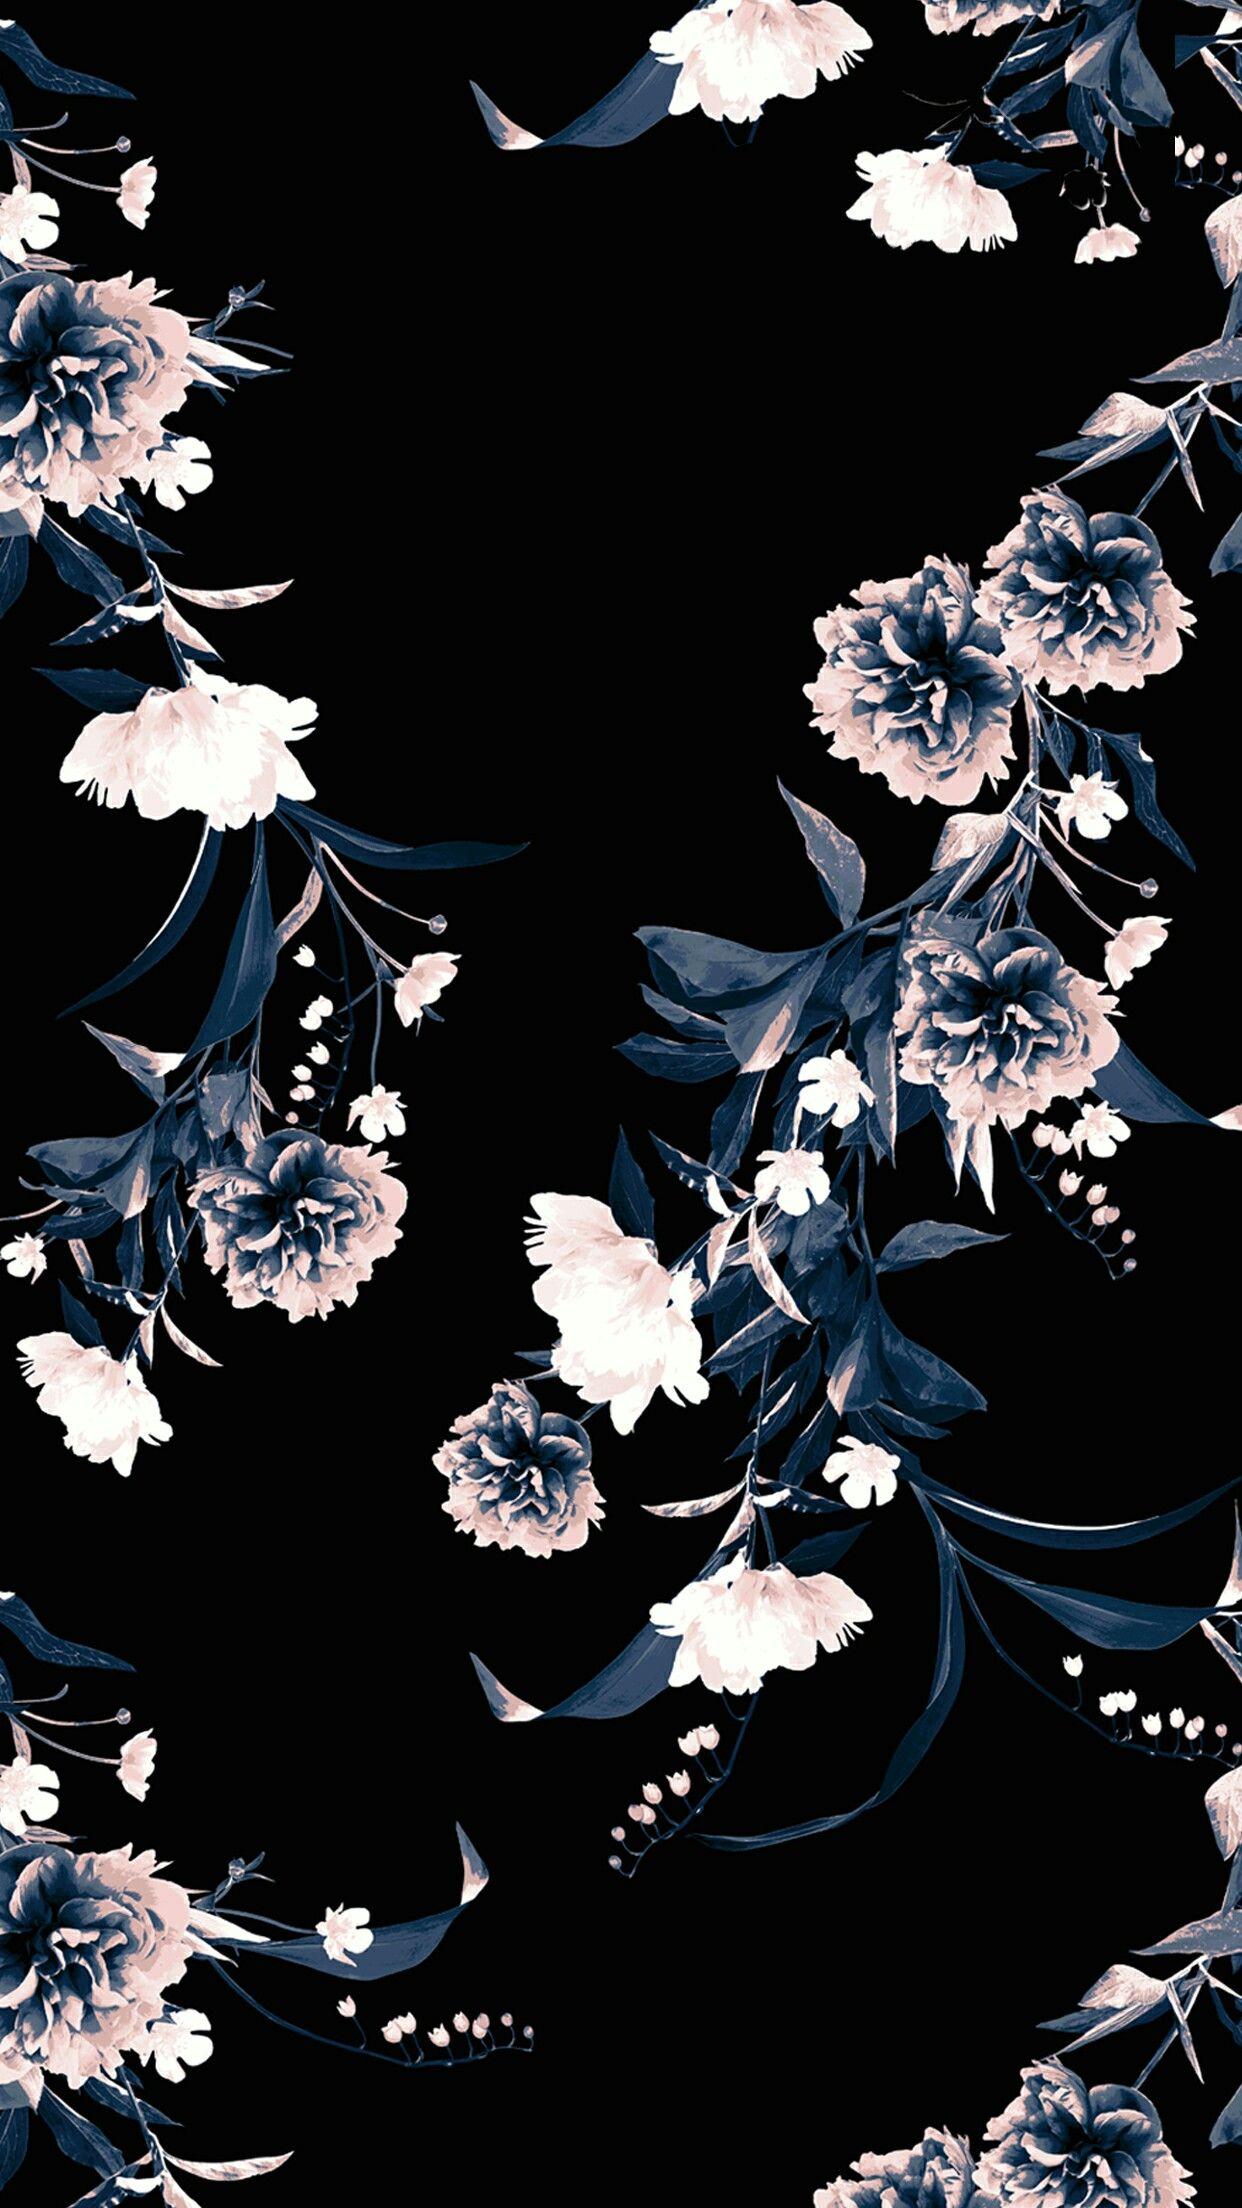 Pin by cuutie1011 on • Wallpapers Flower wallpaper